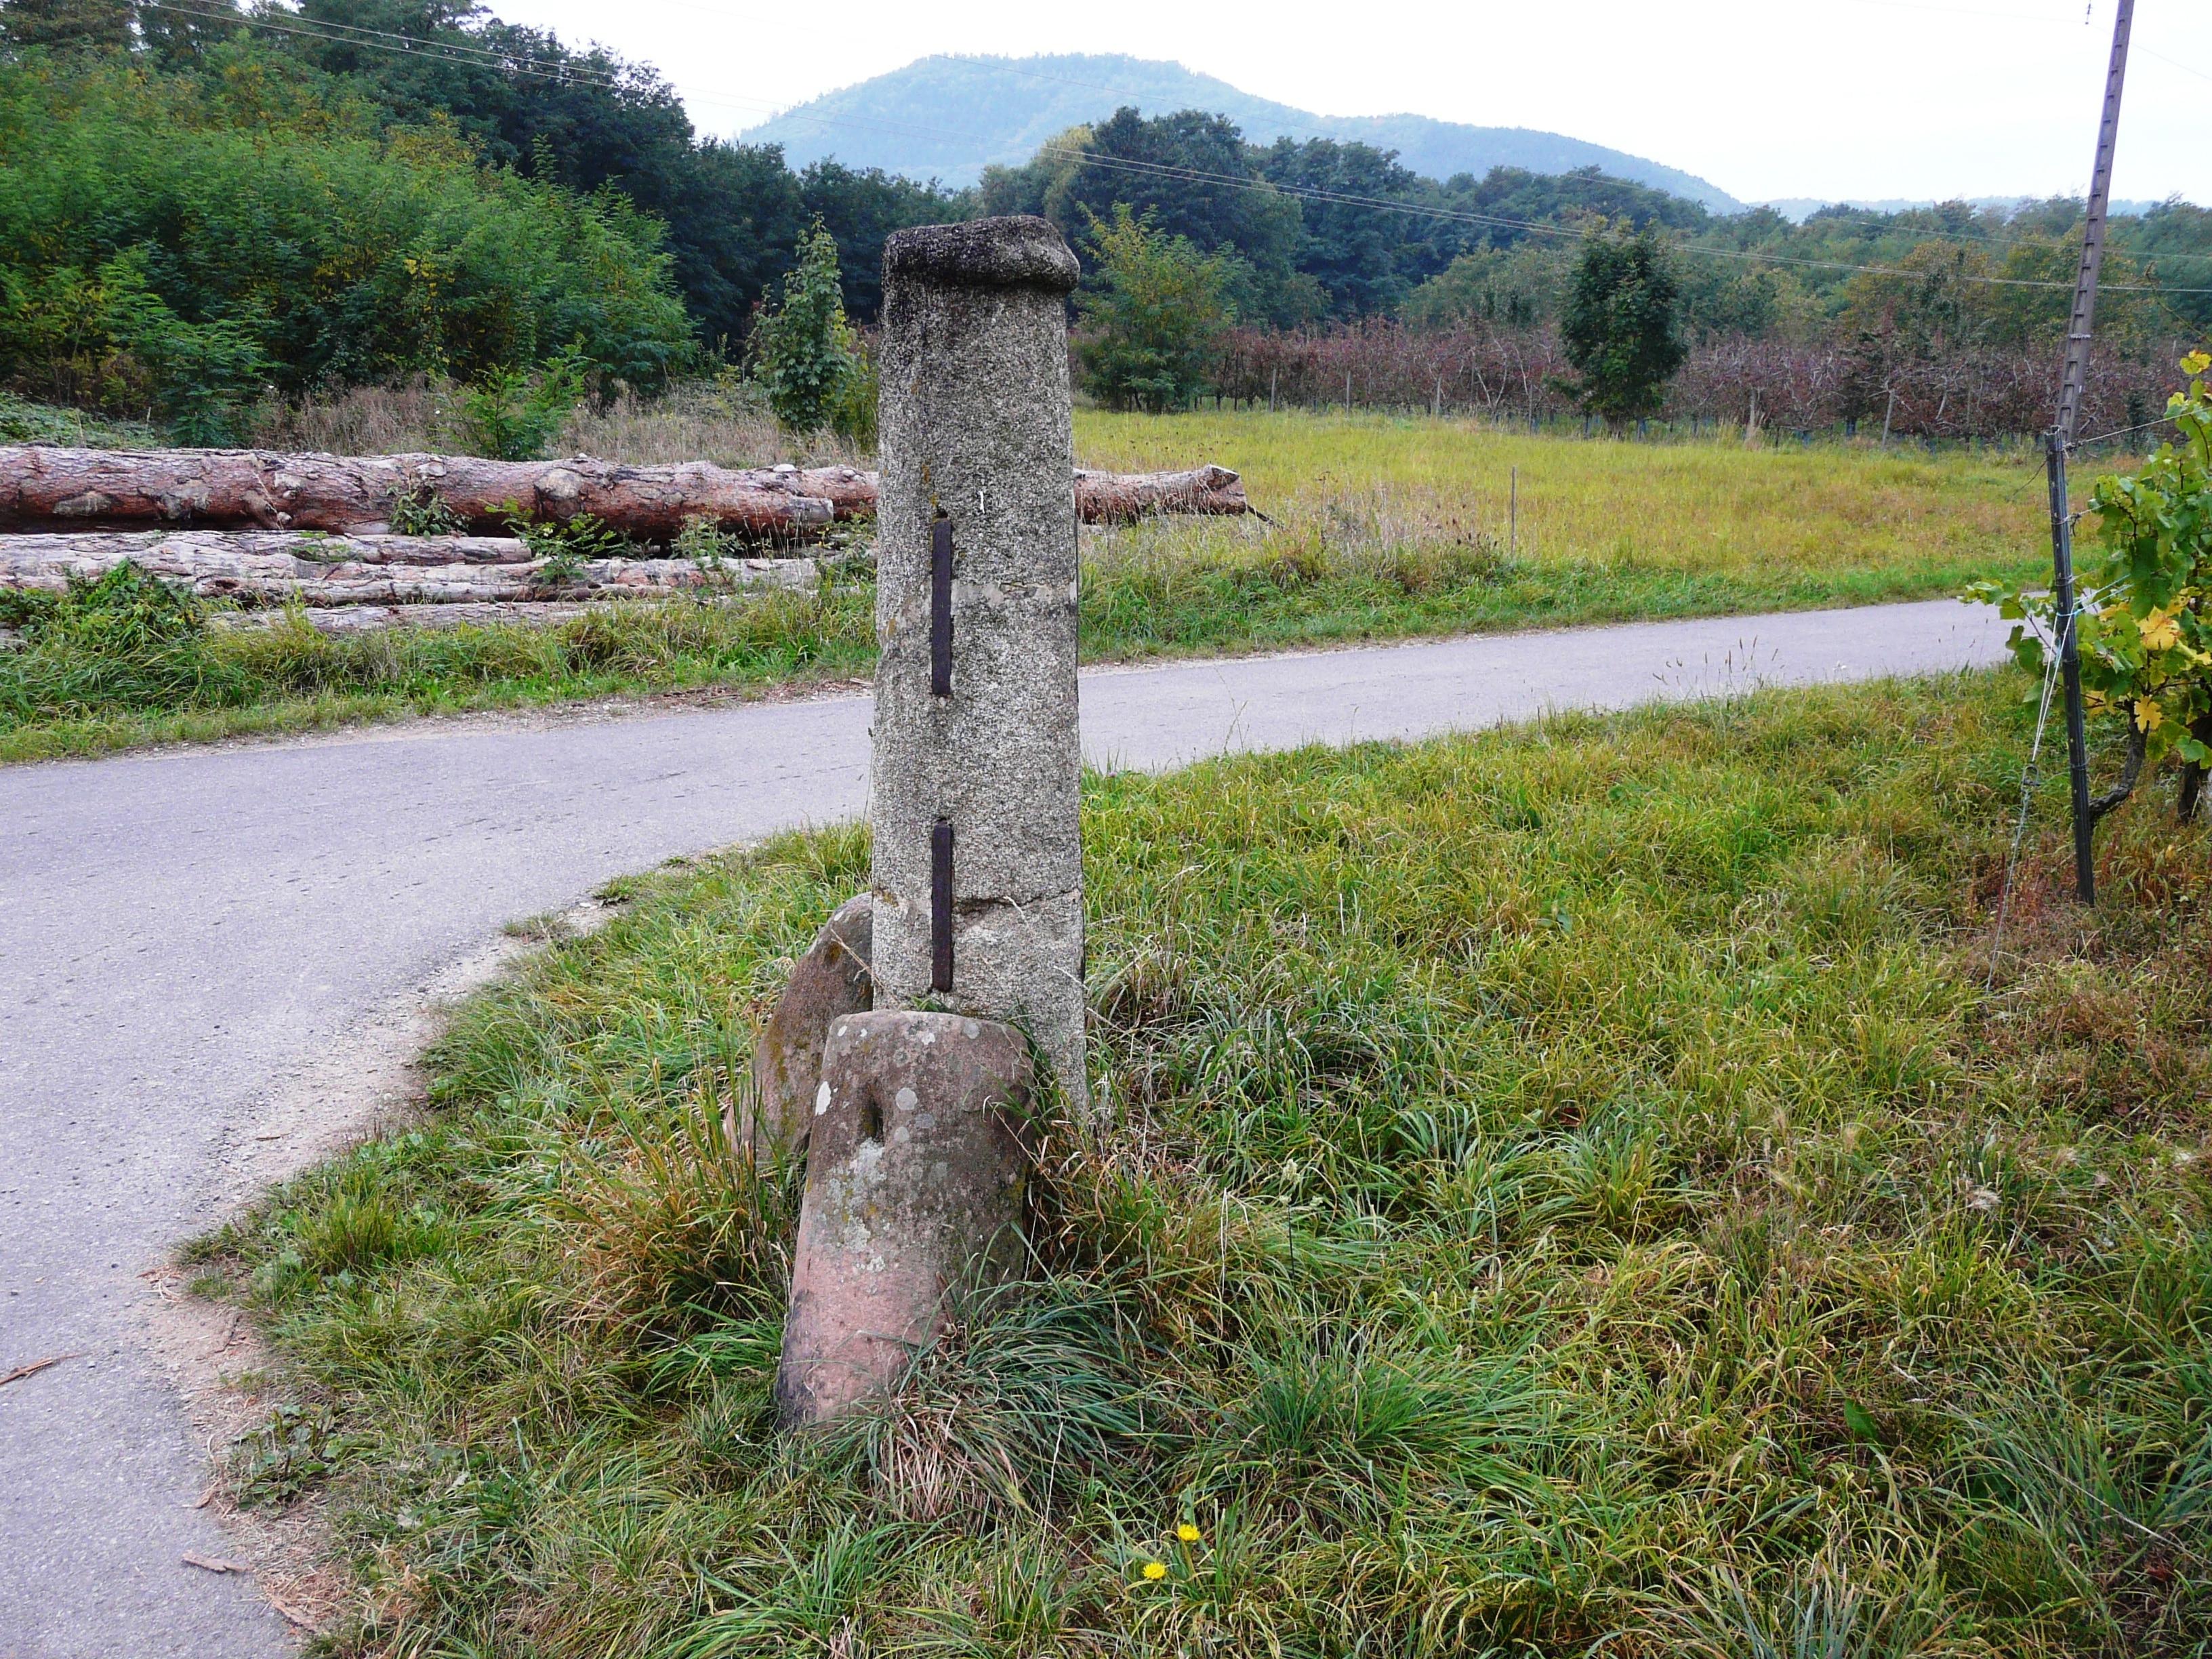 Châtenois, Bas-Rhin (departement), Frankrijk